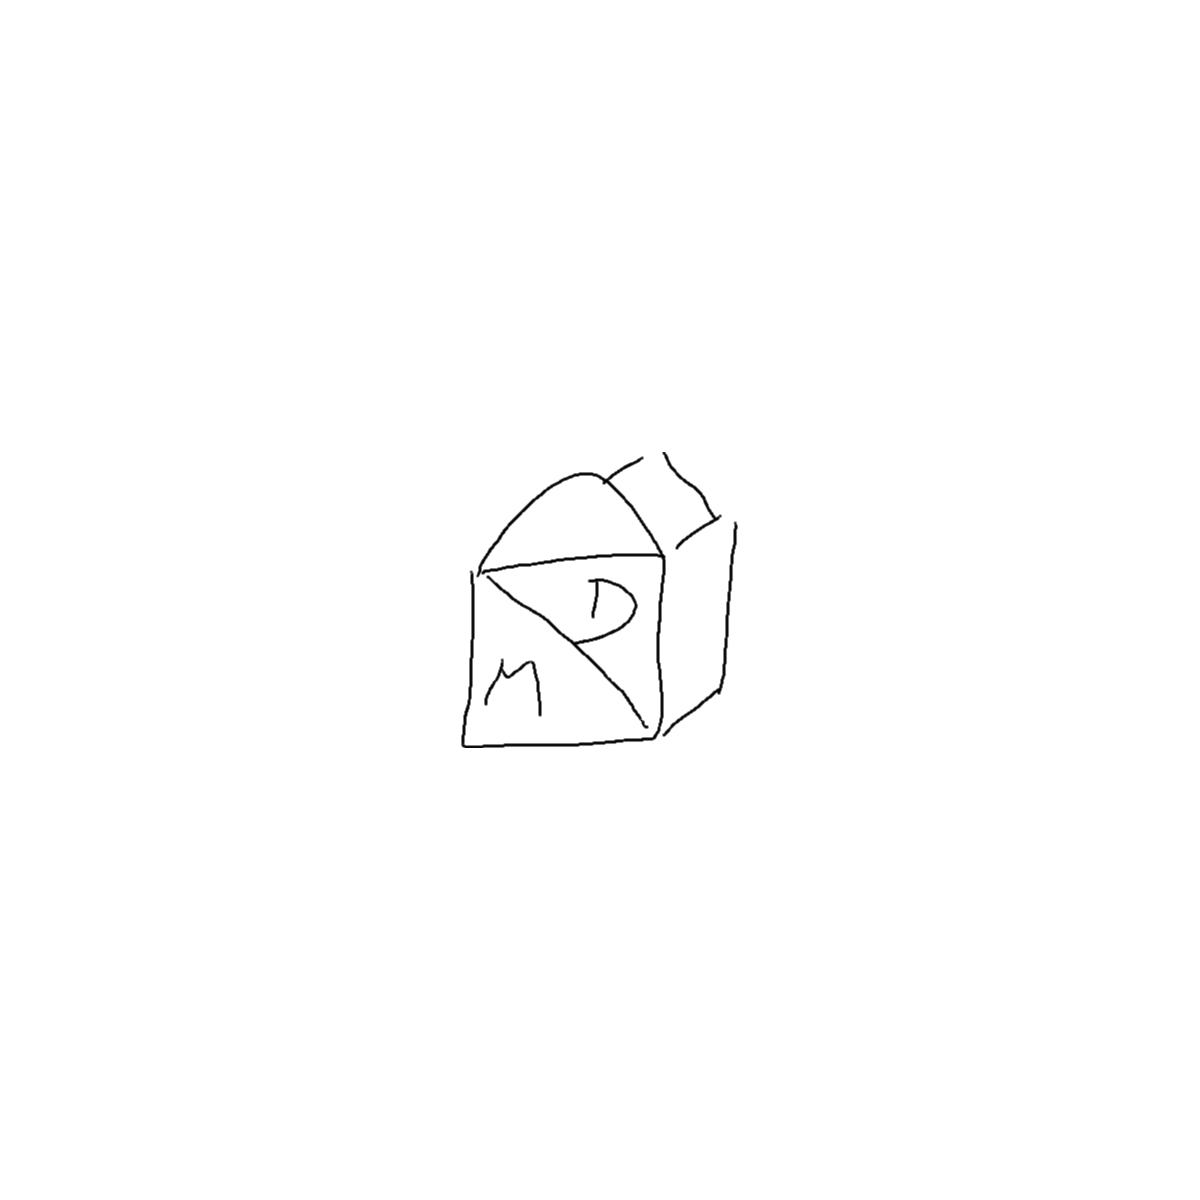 BAAAM drawing#16381 lat:50.0975494384765600lng: 8.2780923843383790